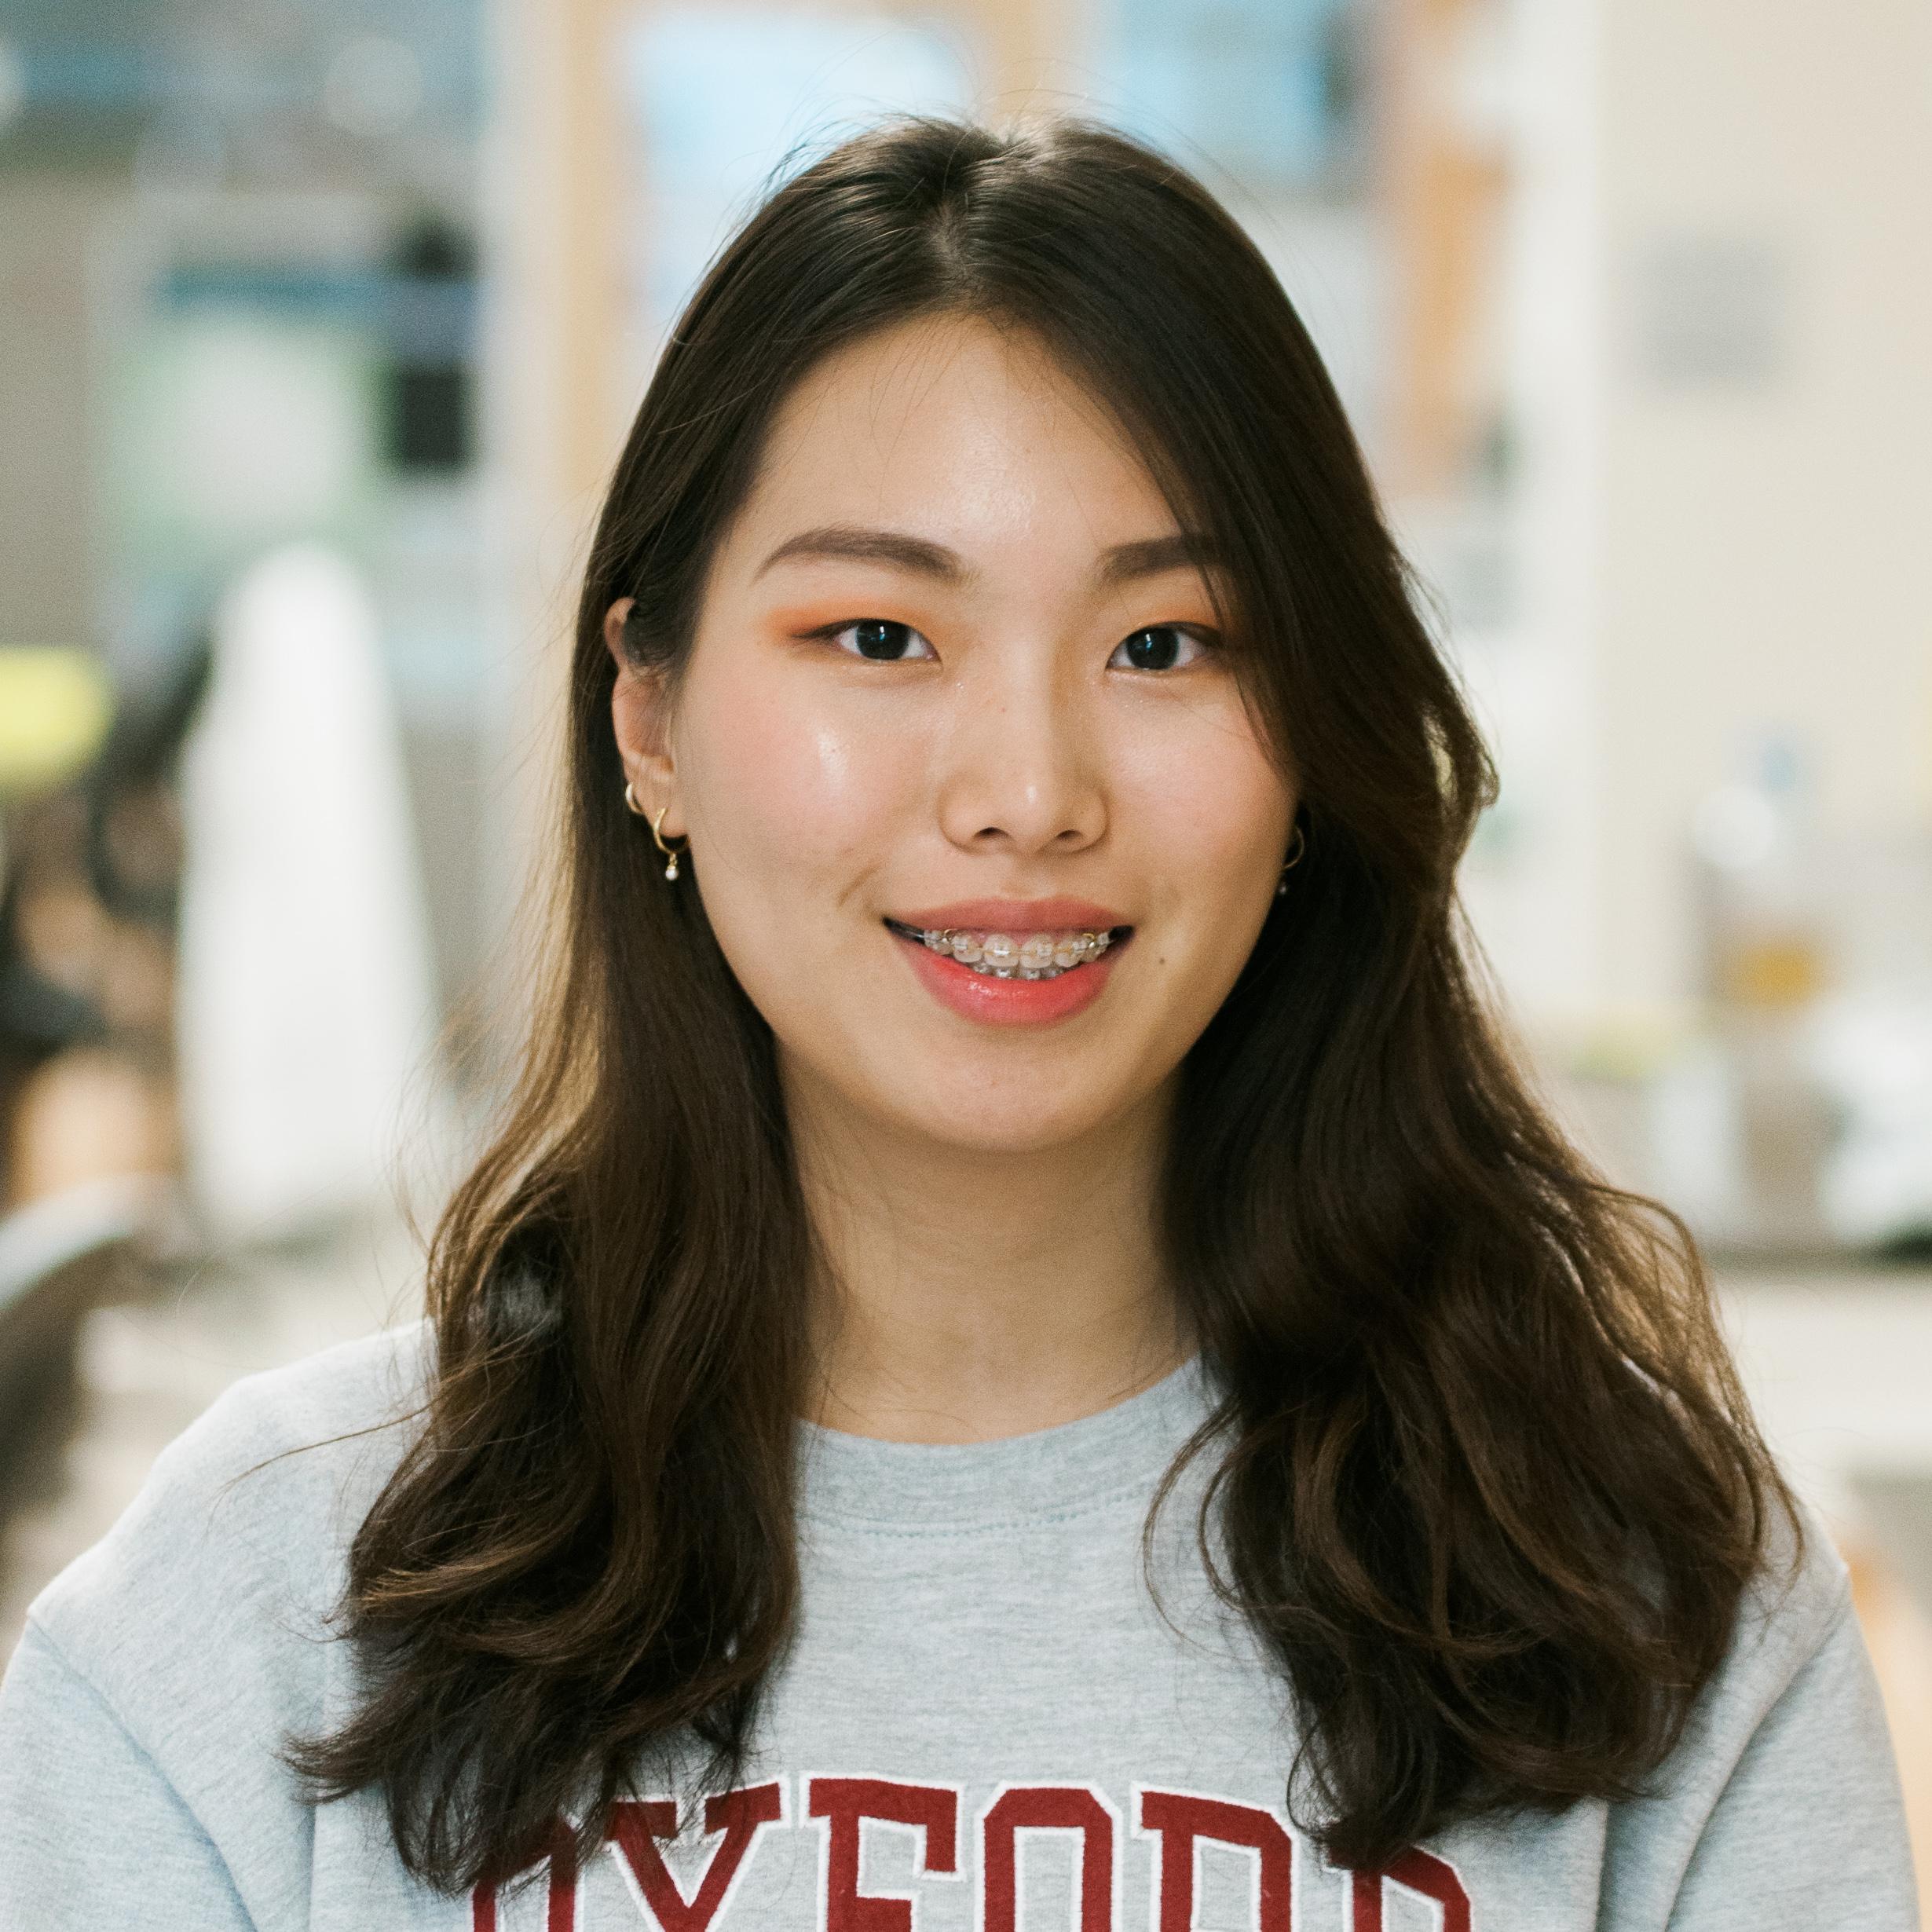 JooHee Choi joohee.choi [at] wustl.edu